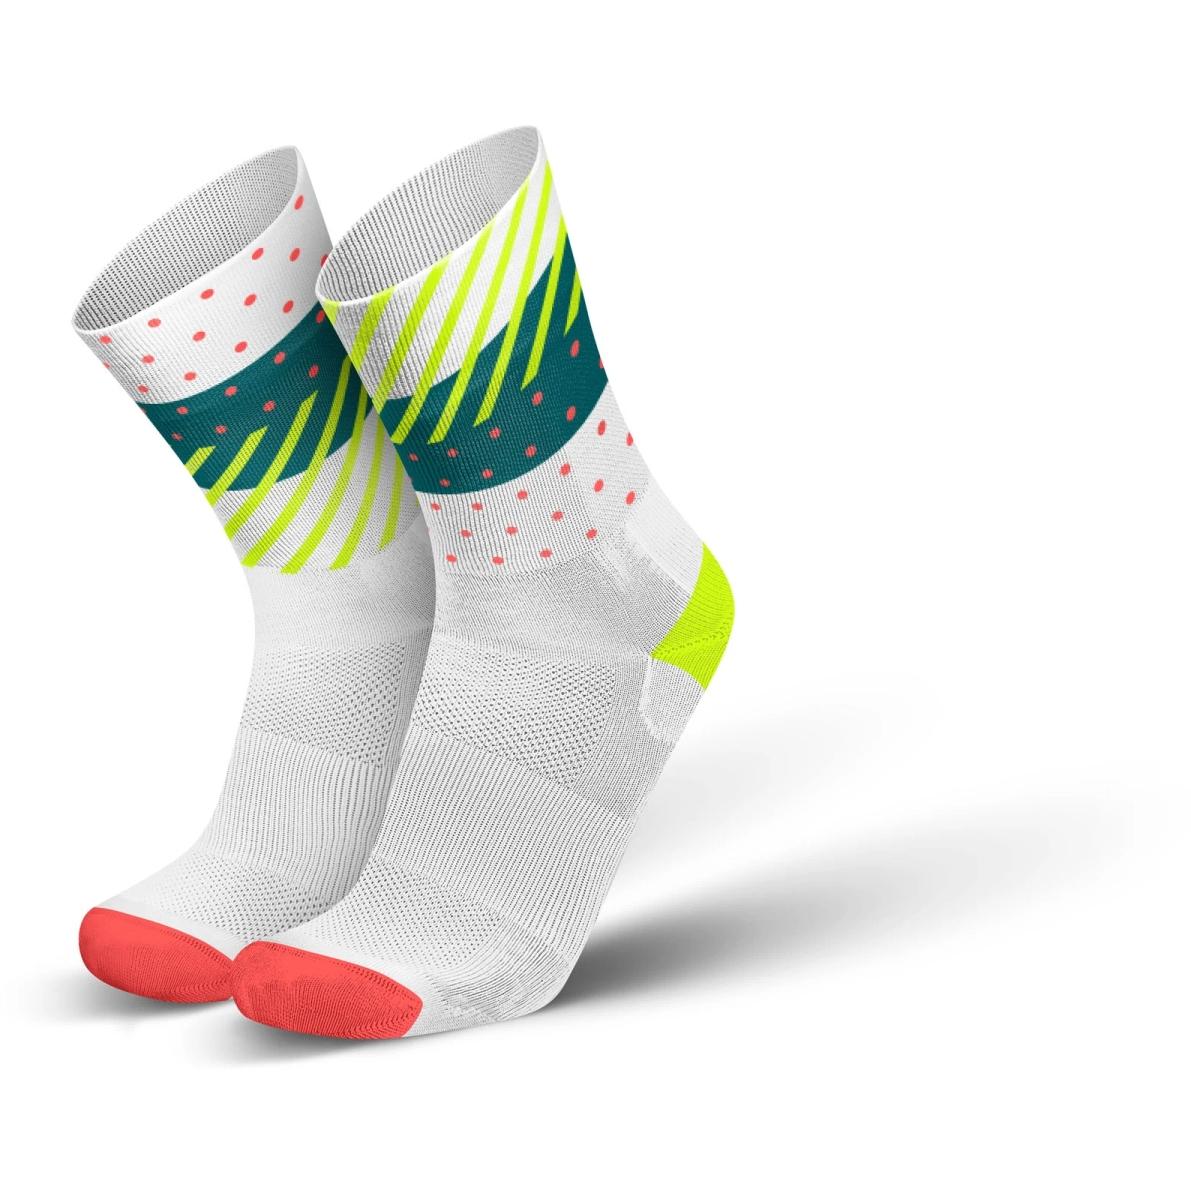 Produktbild von INCYLENCE Ultralight Wildness Socken - Canary